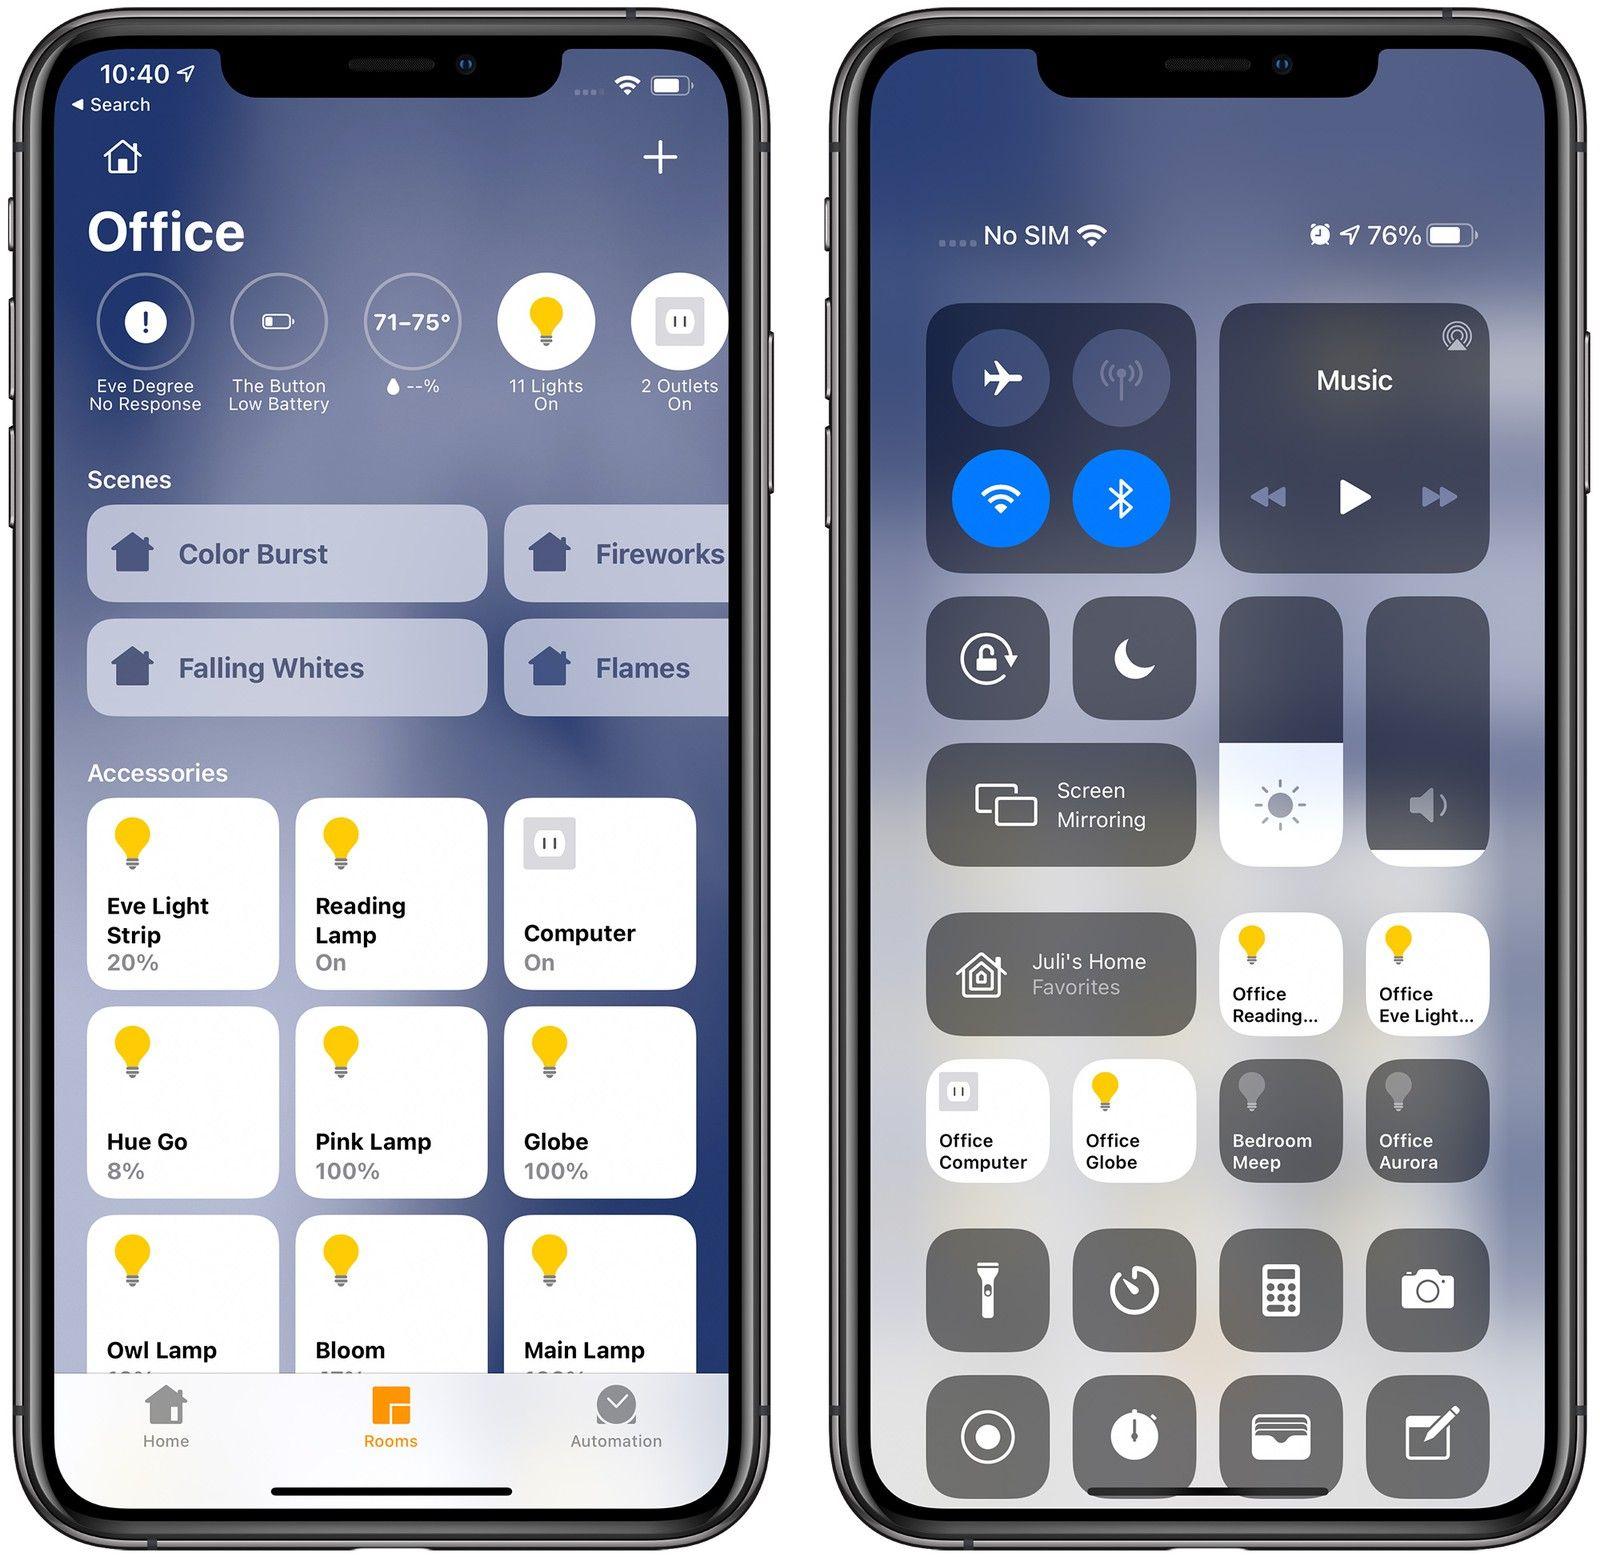 iOS 14 Complete Guide and Breaking Rumors in 2020